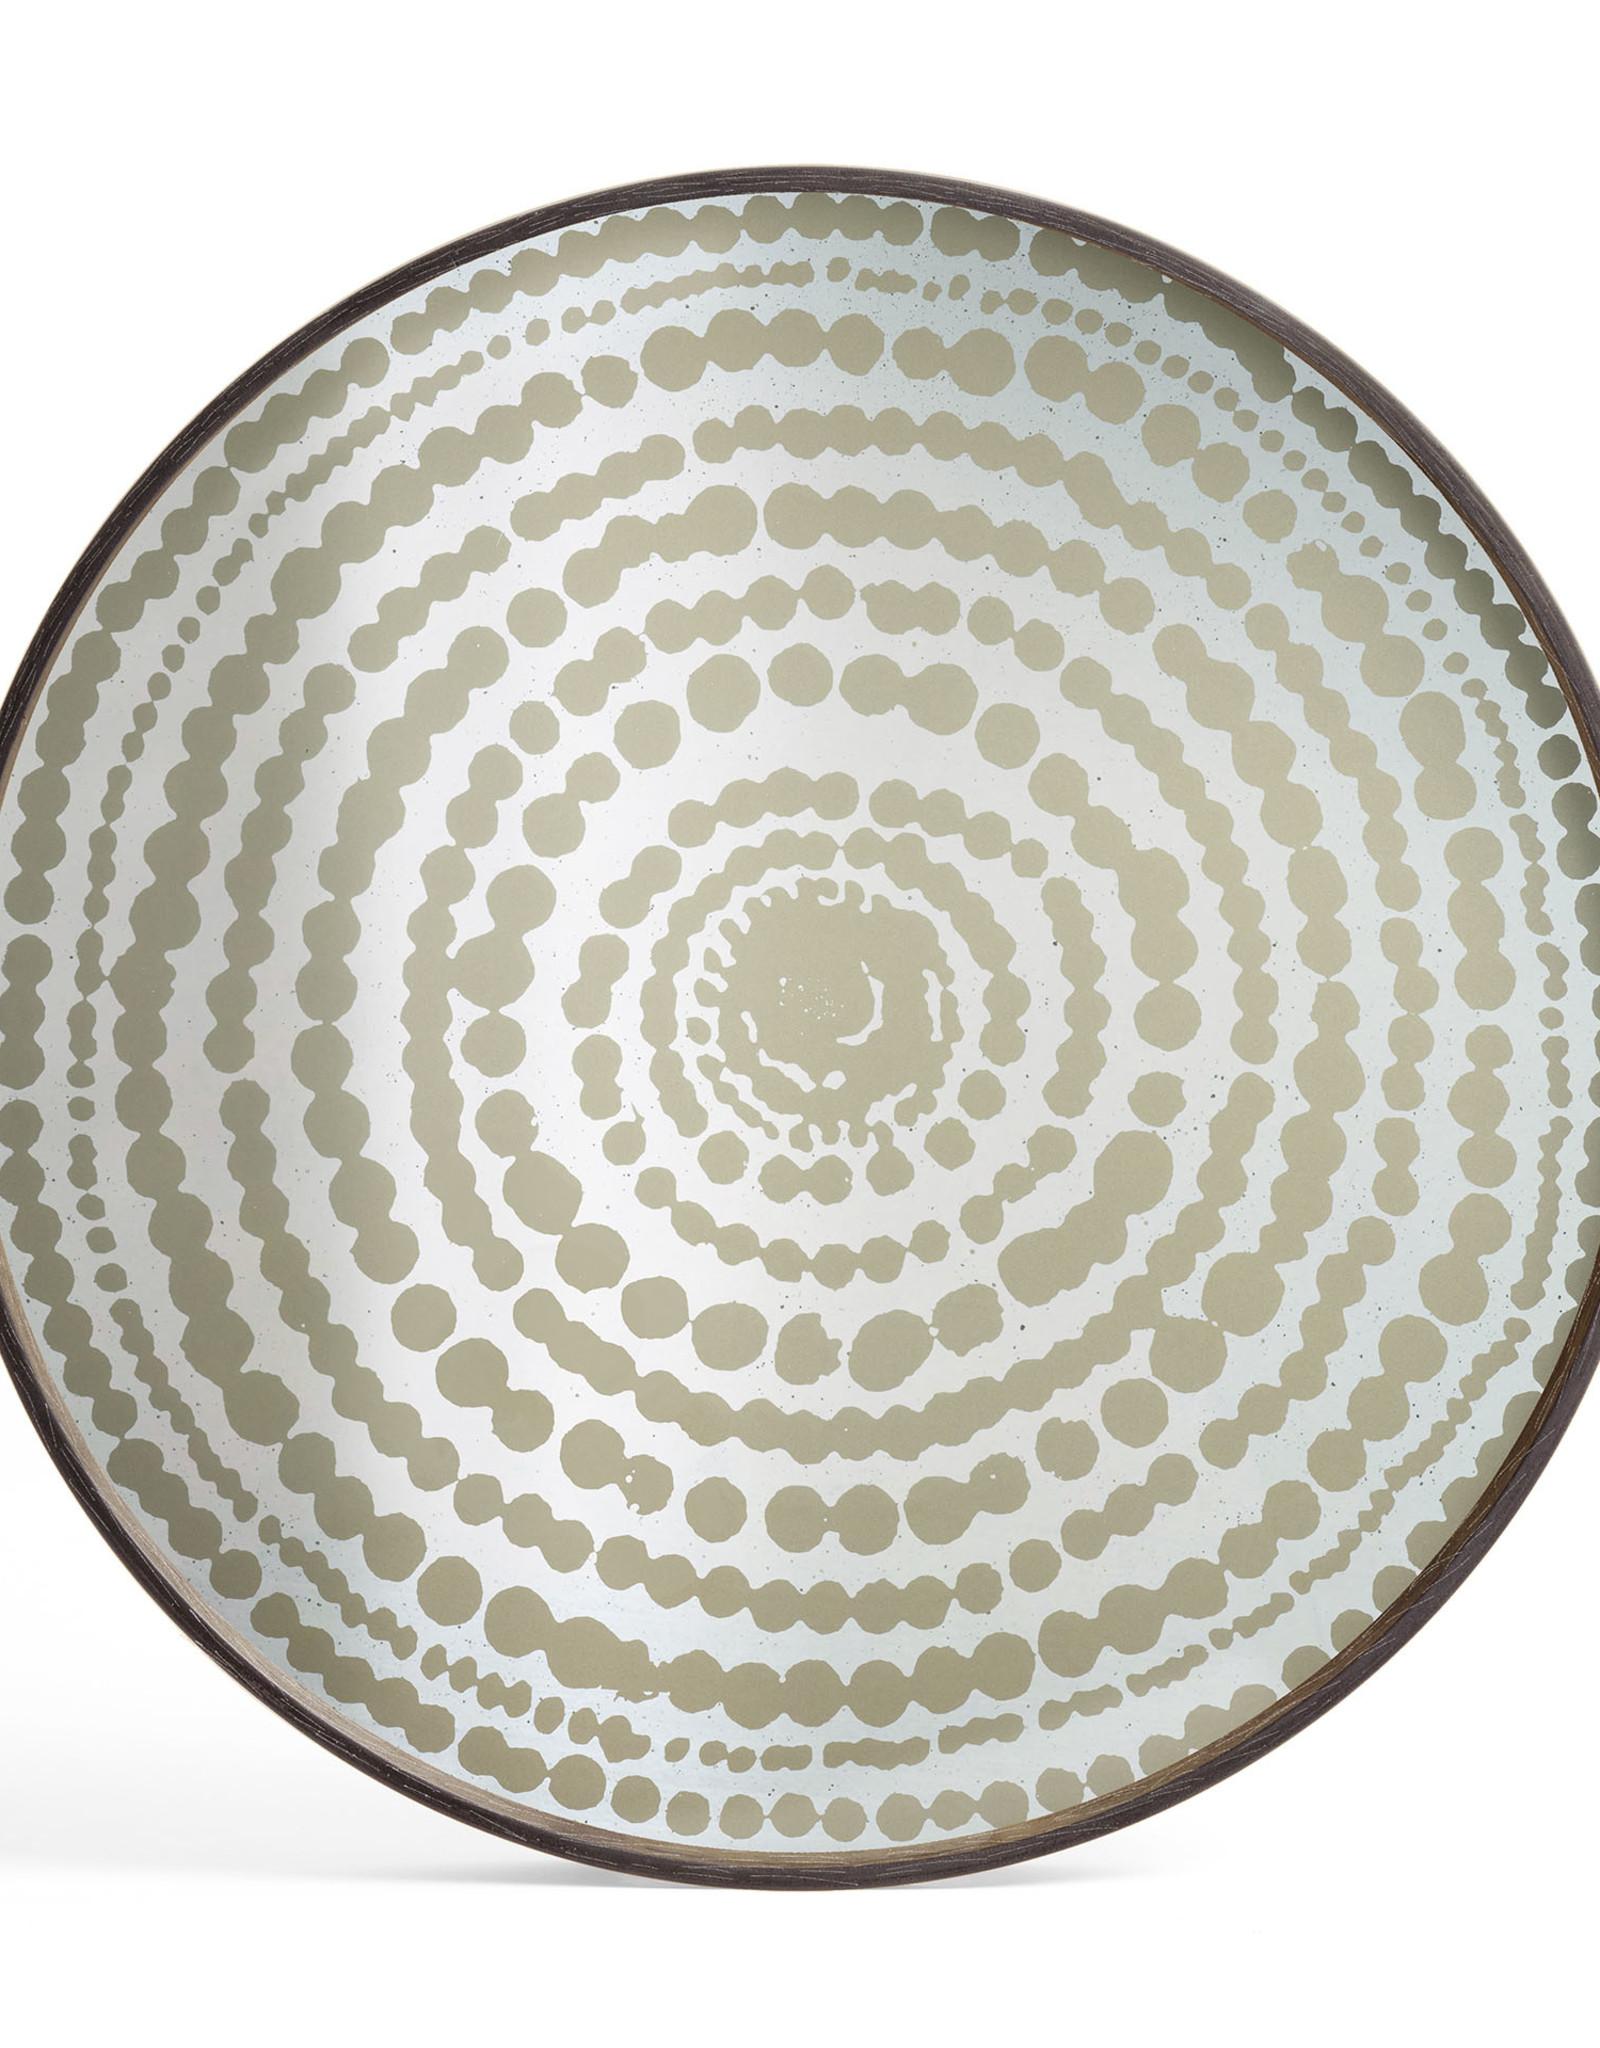 Gold Beads mirror tray - round - L 24 x 24 x 2